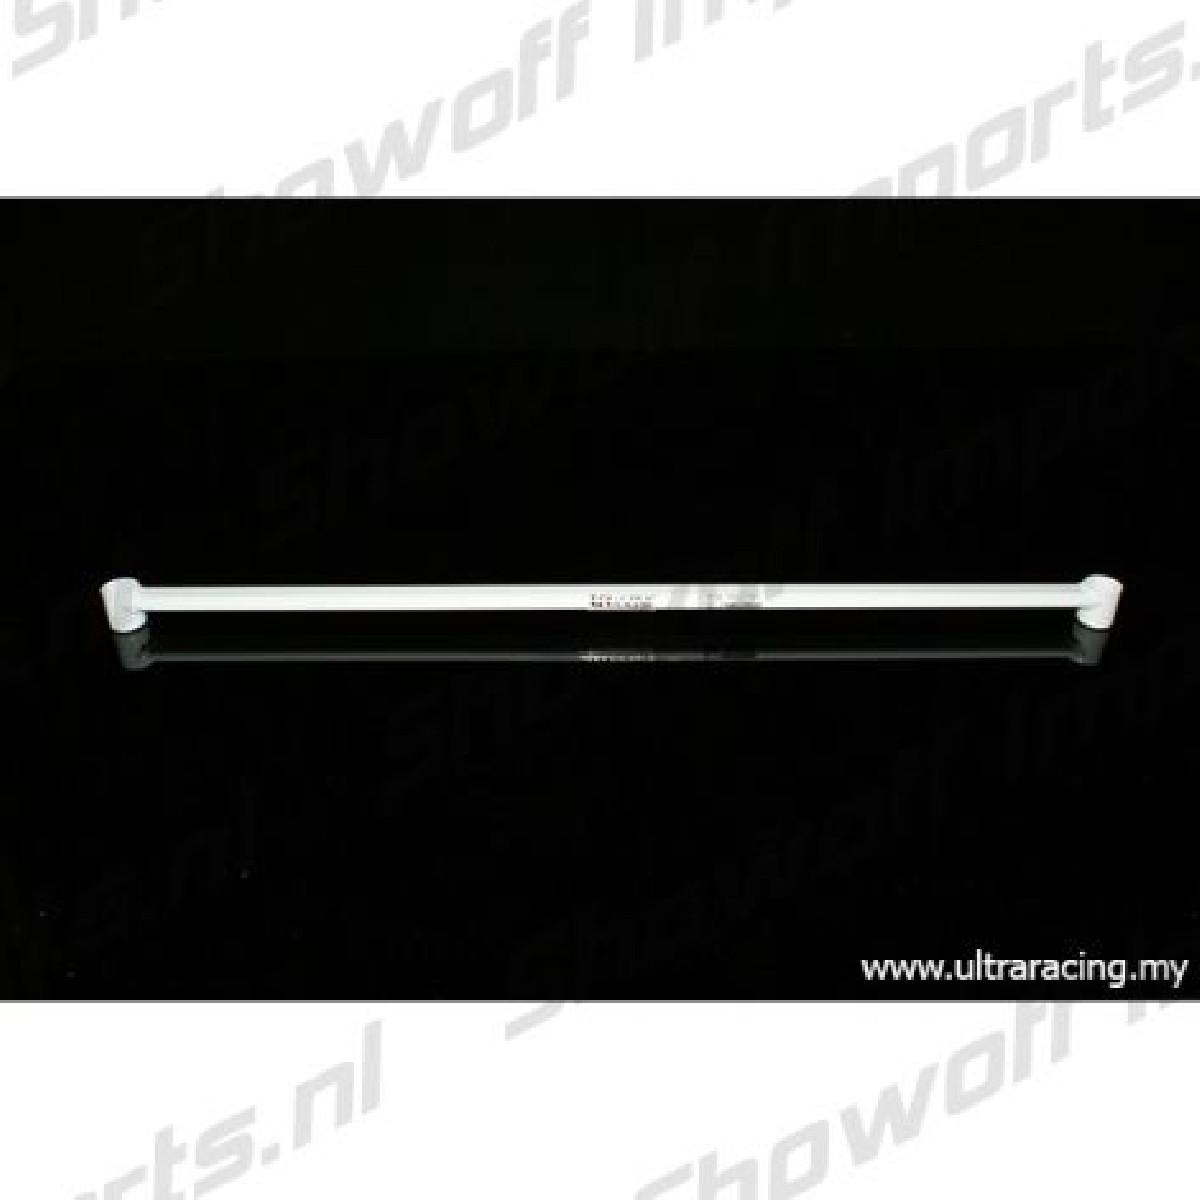 A7 10+ UltraRacing 2-Point Rear Torsion Bar 2490